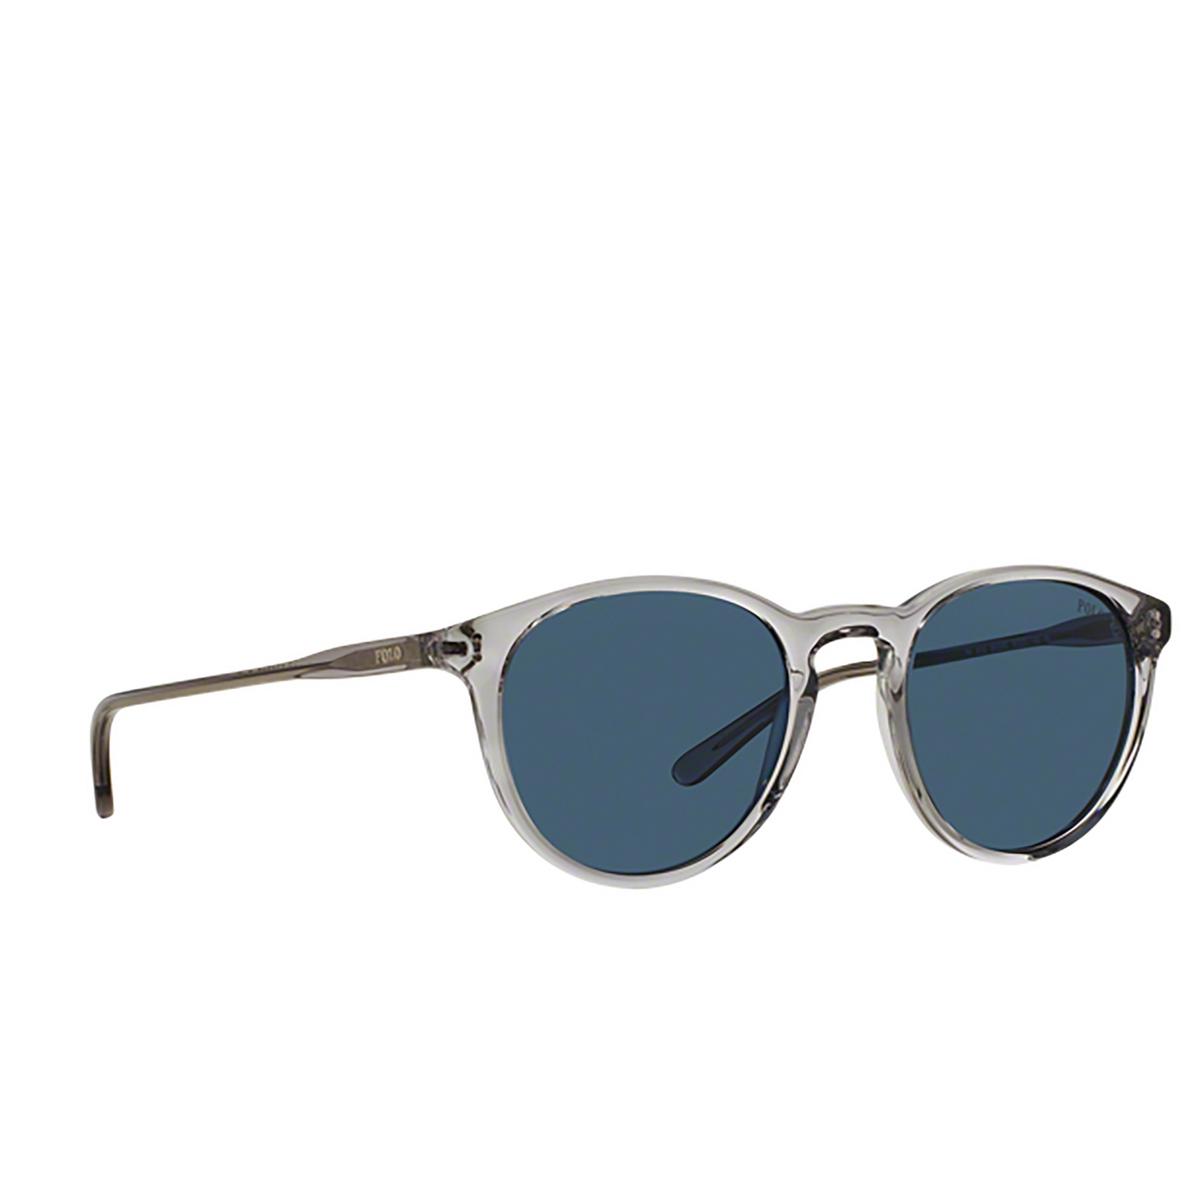 Polo Ralph Lauren® Round Sunglasses: PH4110 color Shiny Semi-transparent Grey 541380.